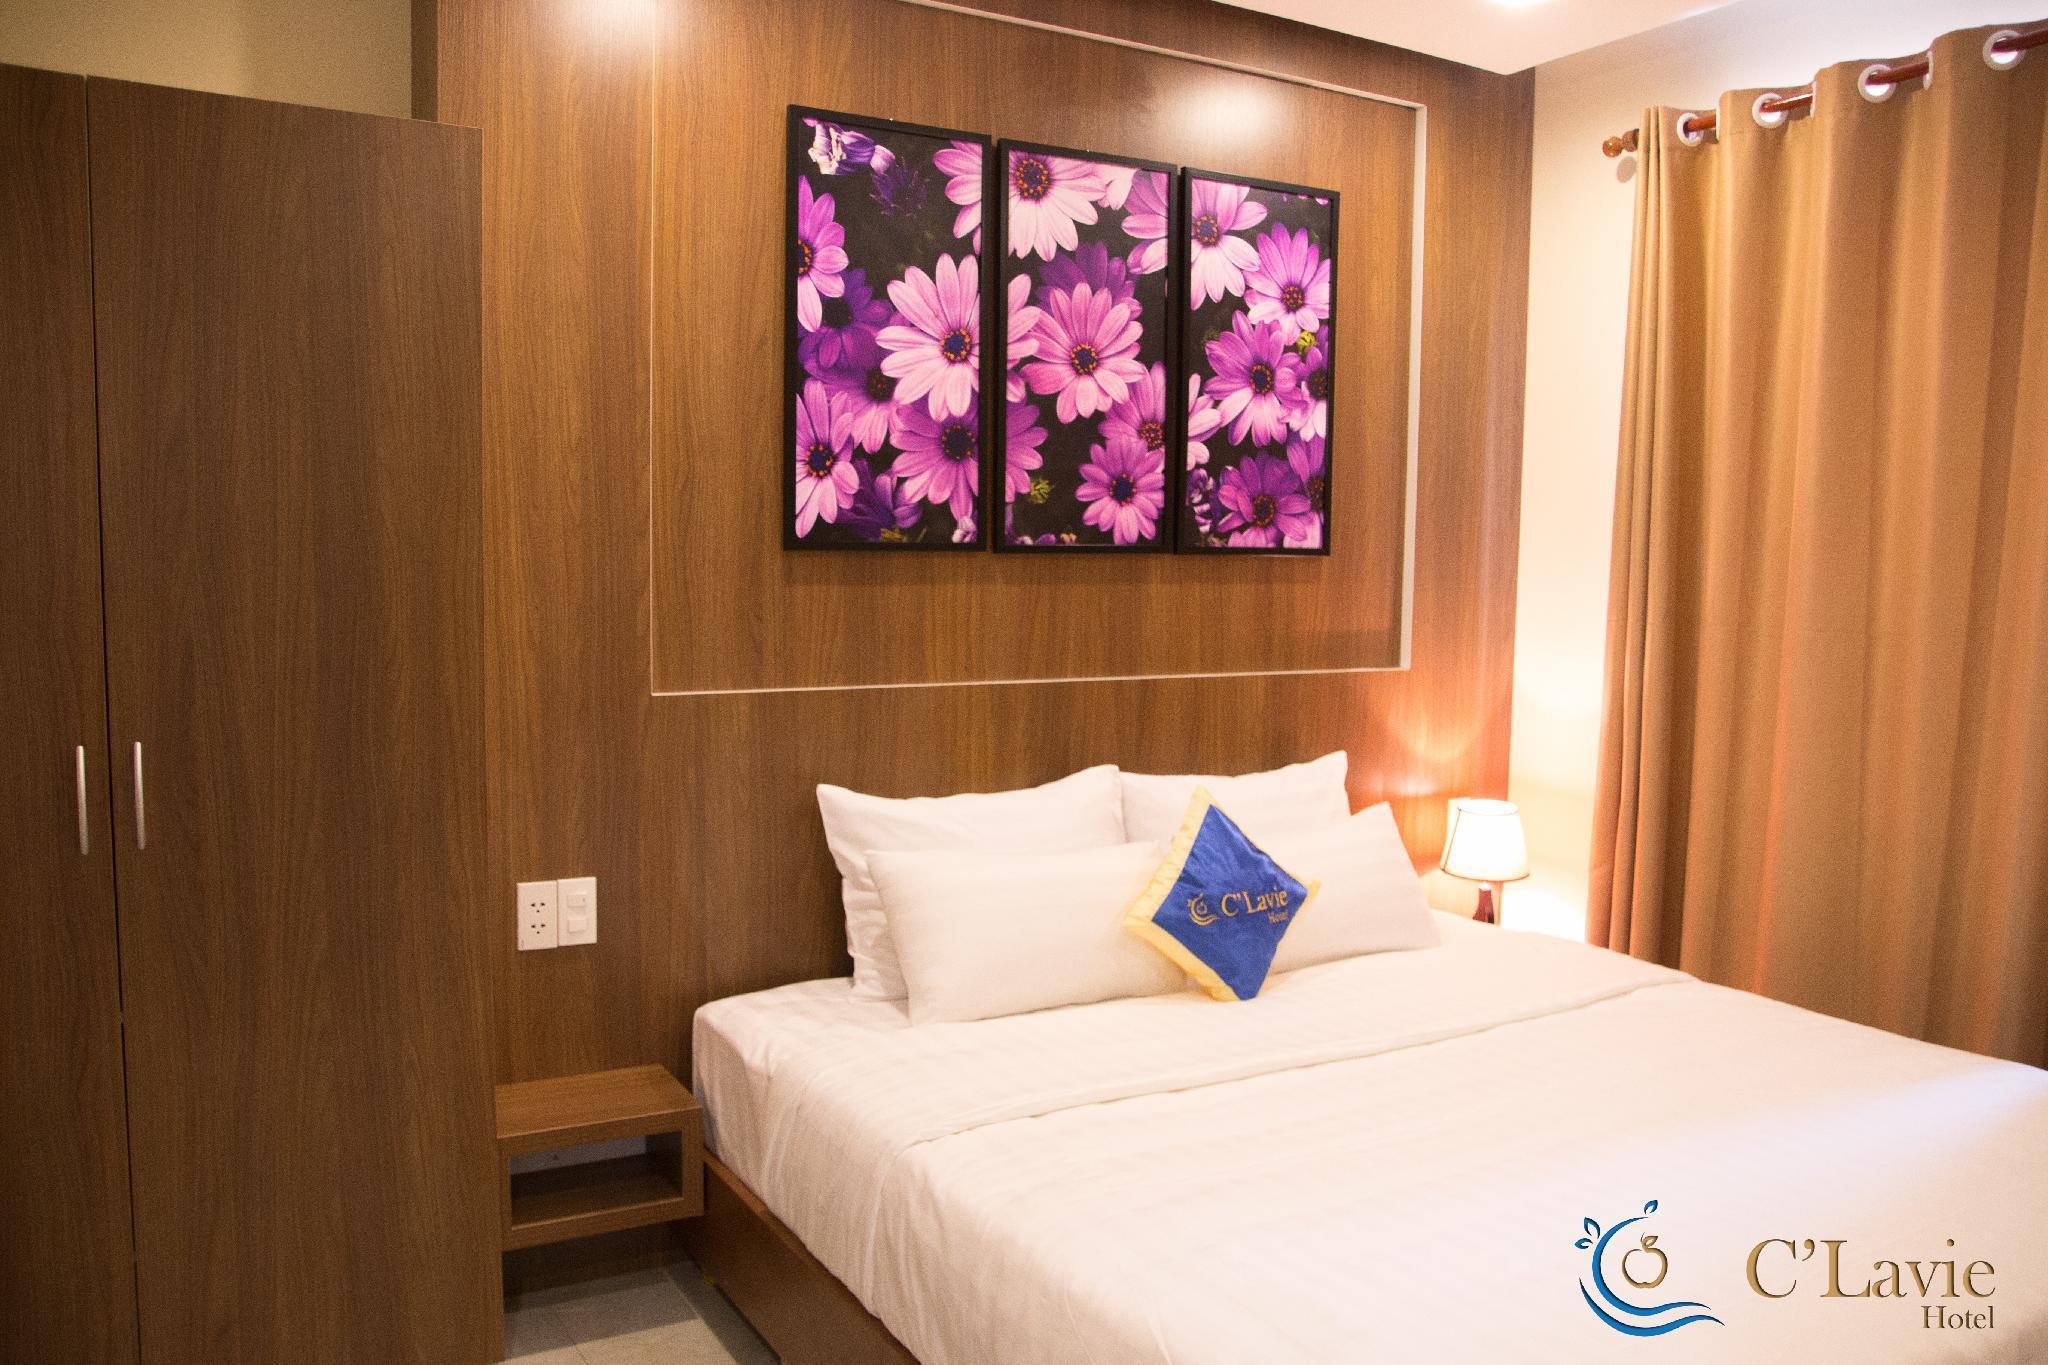 CLavie Hotel  Saigon Airport Hotel